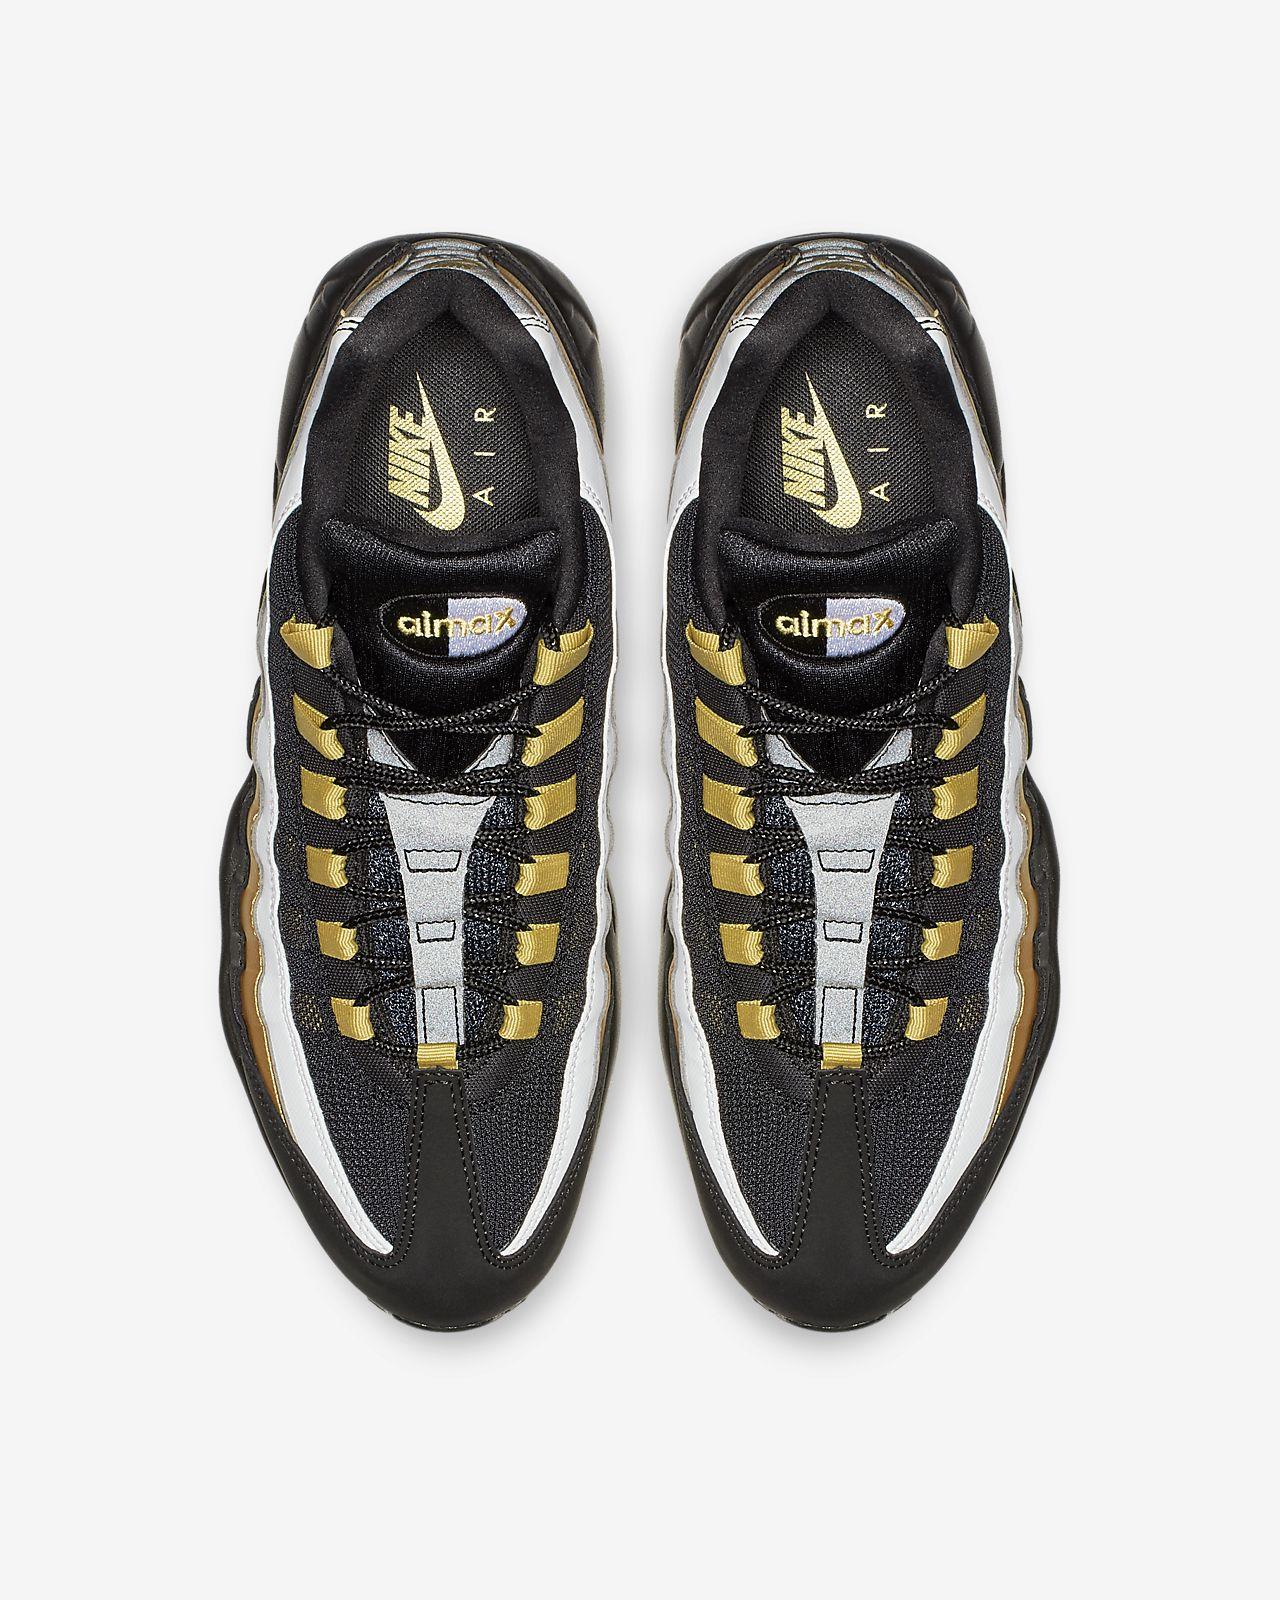 The Nike #AirMax95 OG